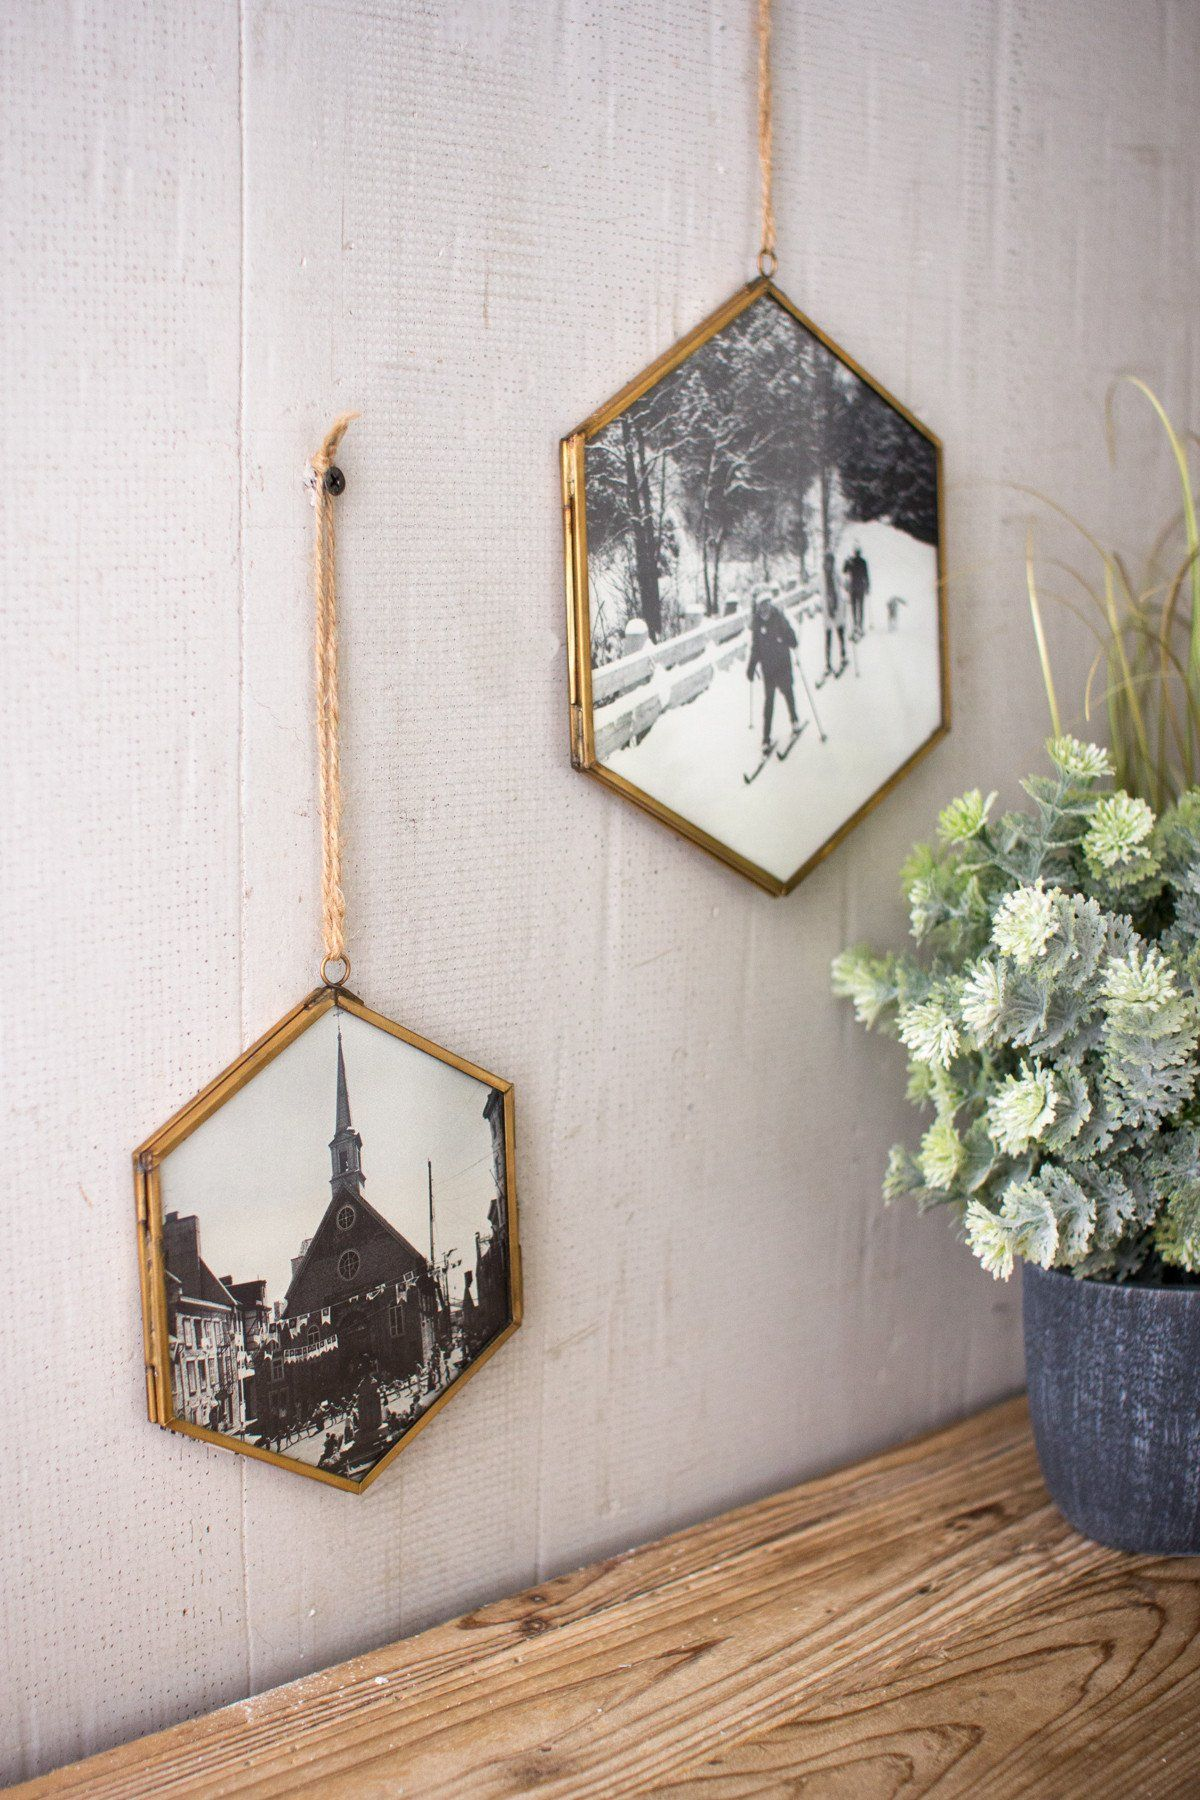 45a0a85725be Kalalou Hexagon Photo Frames With Antique Brass Finish - Set Of 4 ...